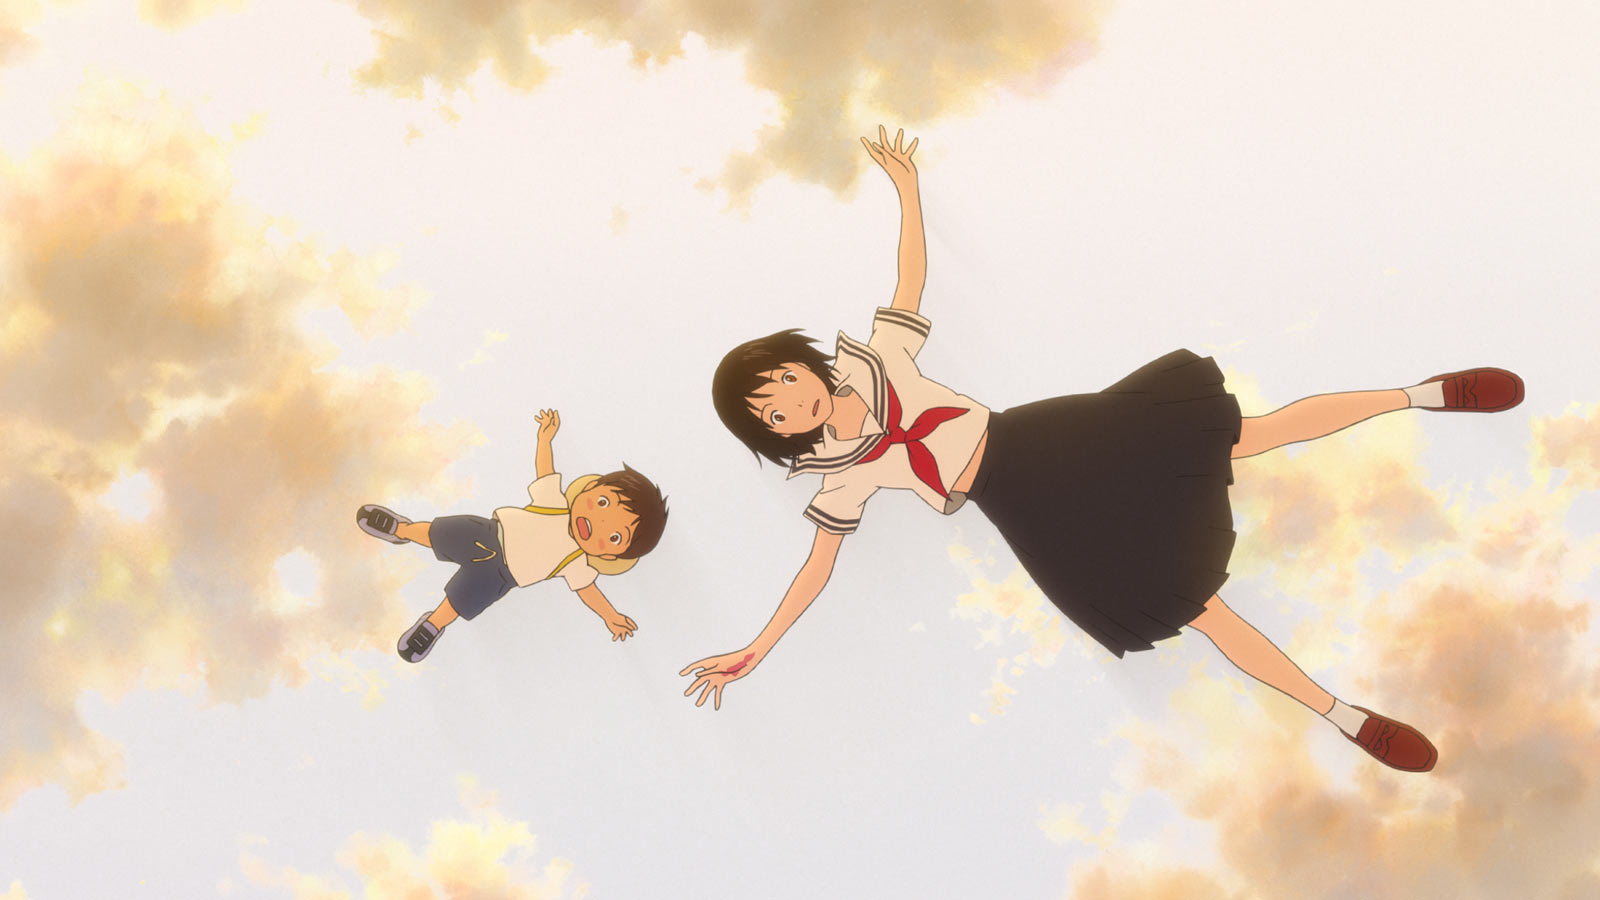 Mirai Mamoru Hosoda cine familiar infantil Modiband